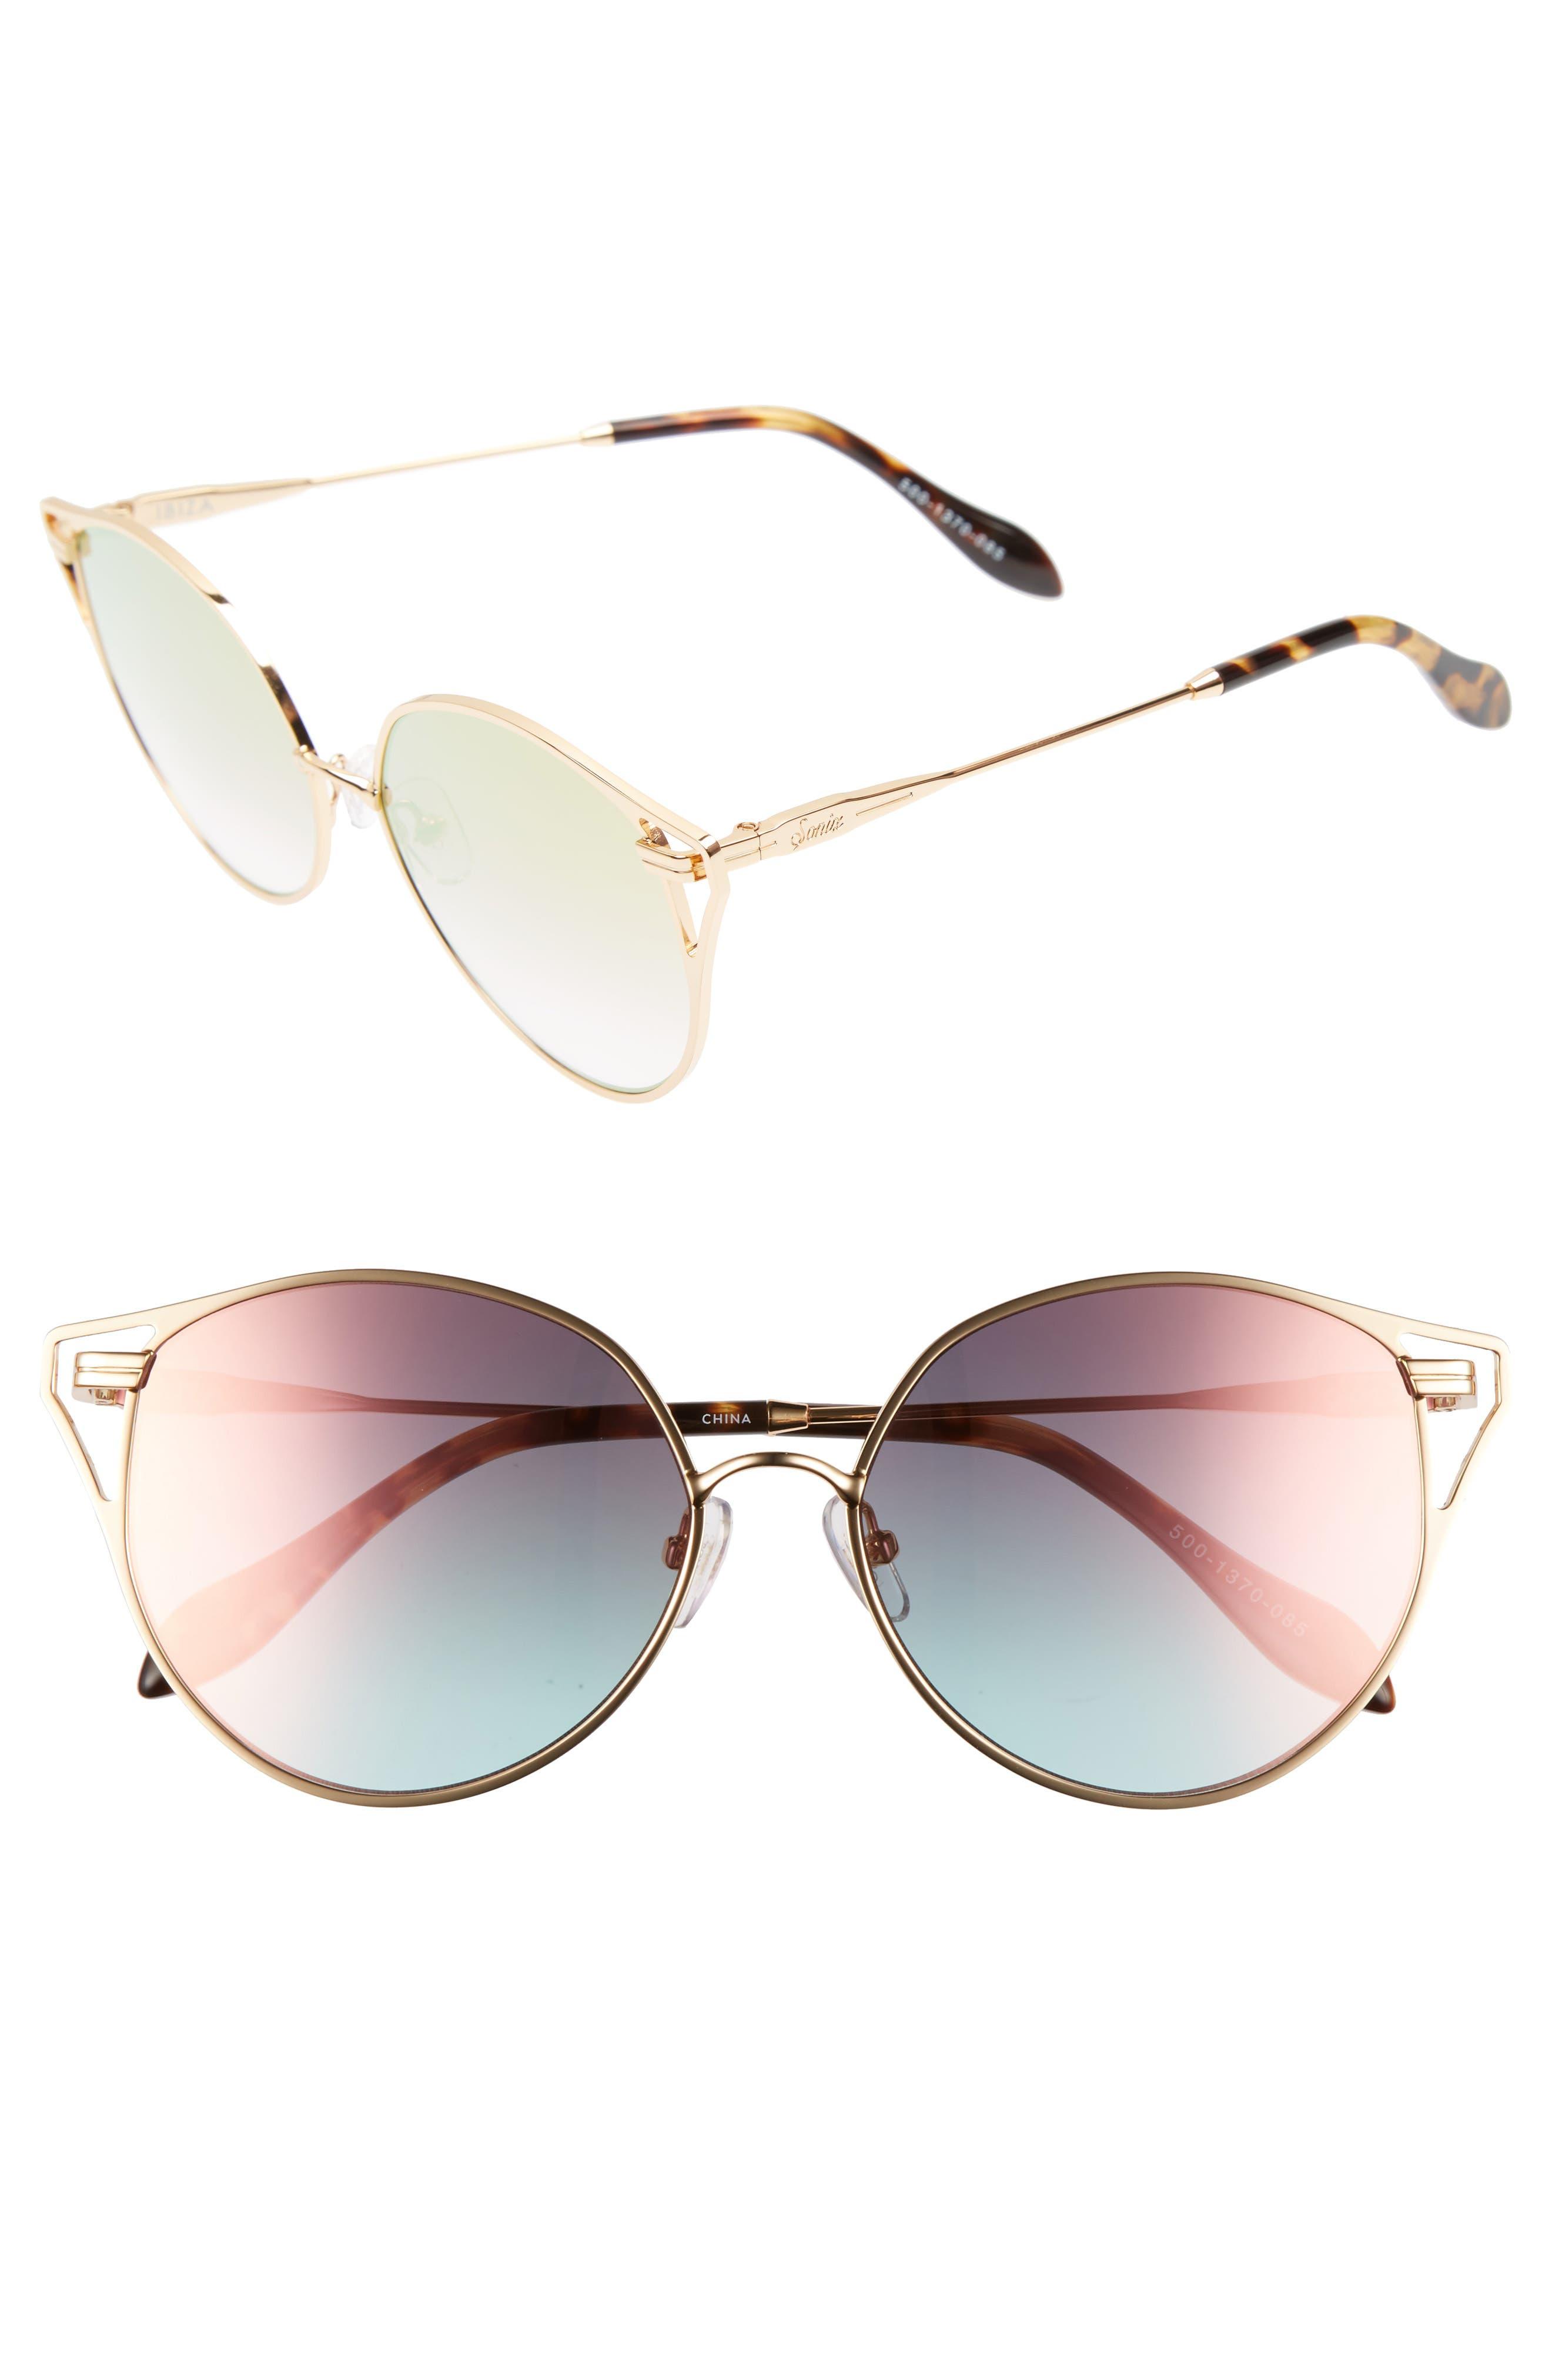 Alternate Image 1 Selected - Sonix Ibiza 55mm Cat Eye Sunglasses